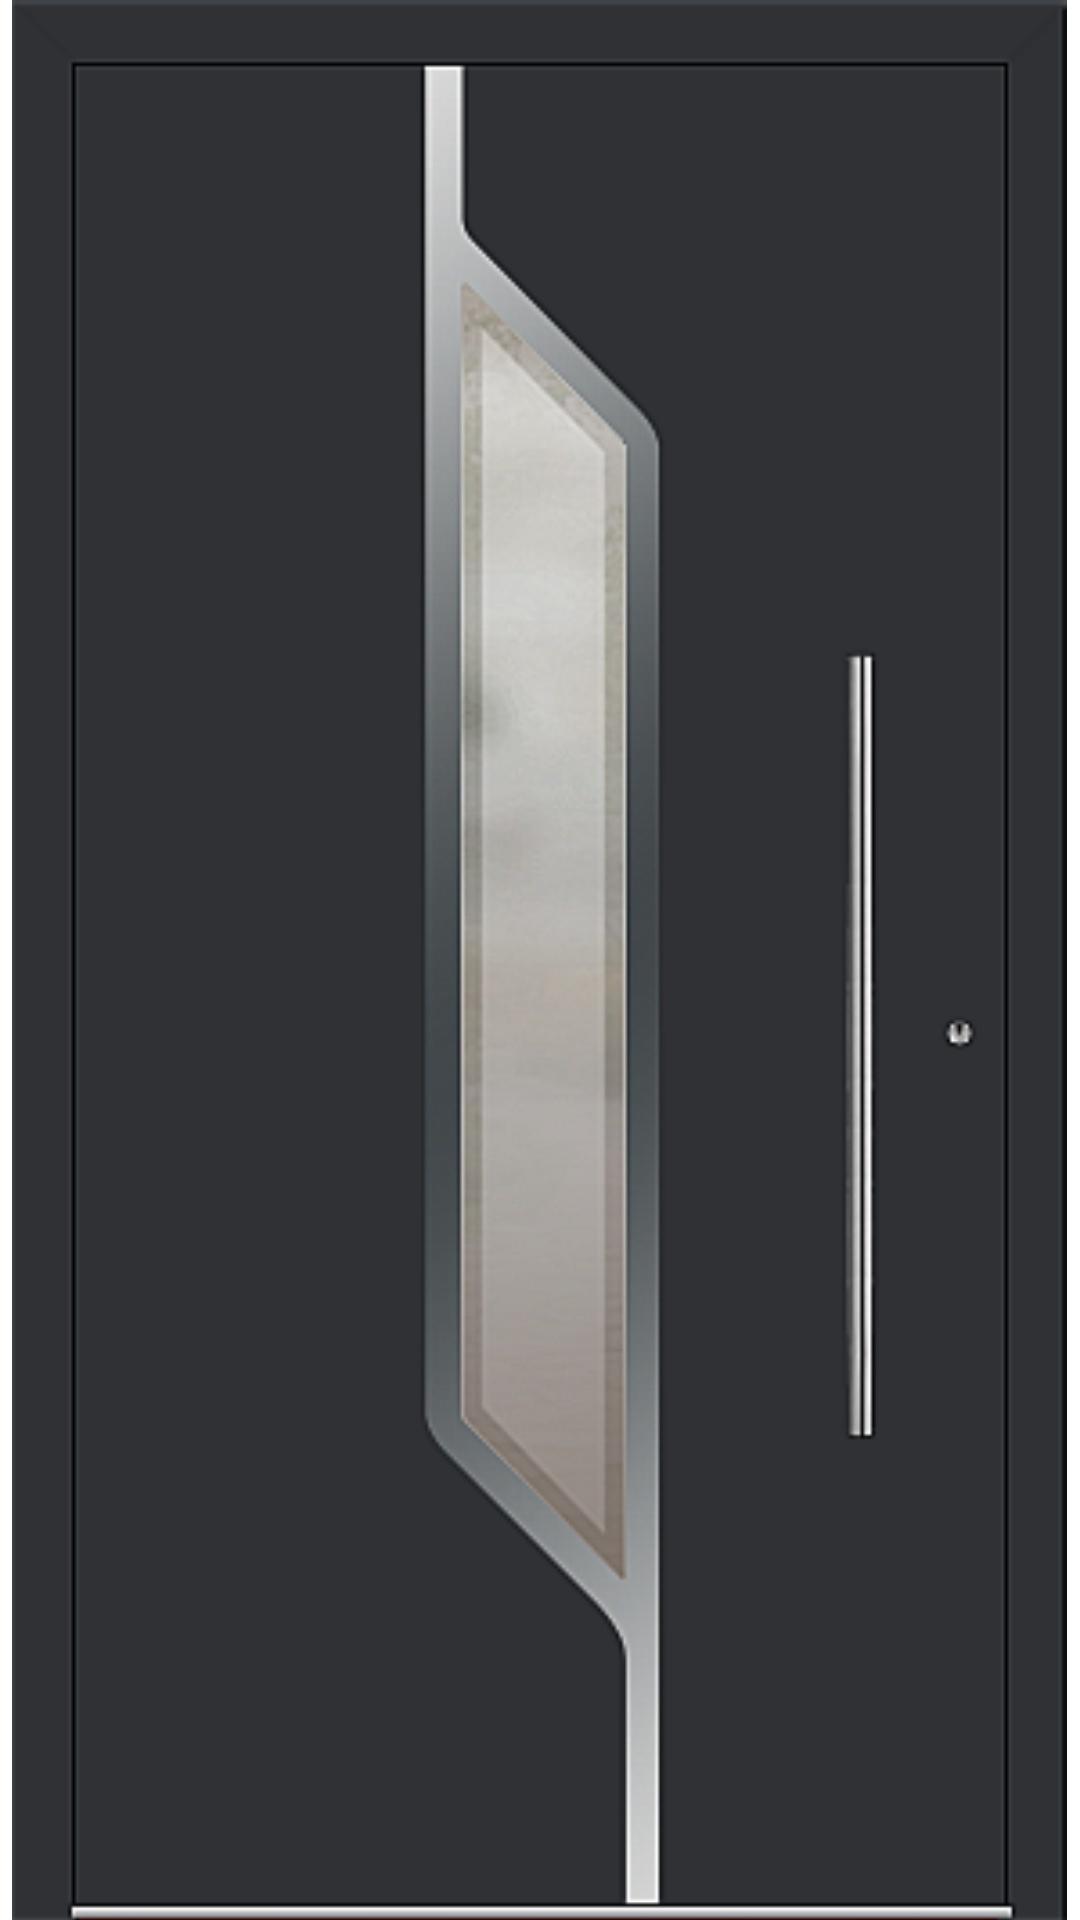 PaXentrée Aluminium Haustür M07120 schwarz